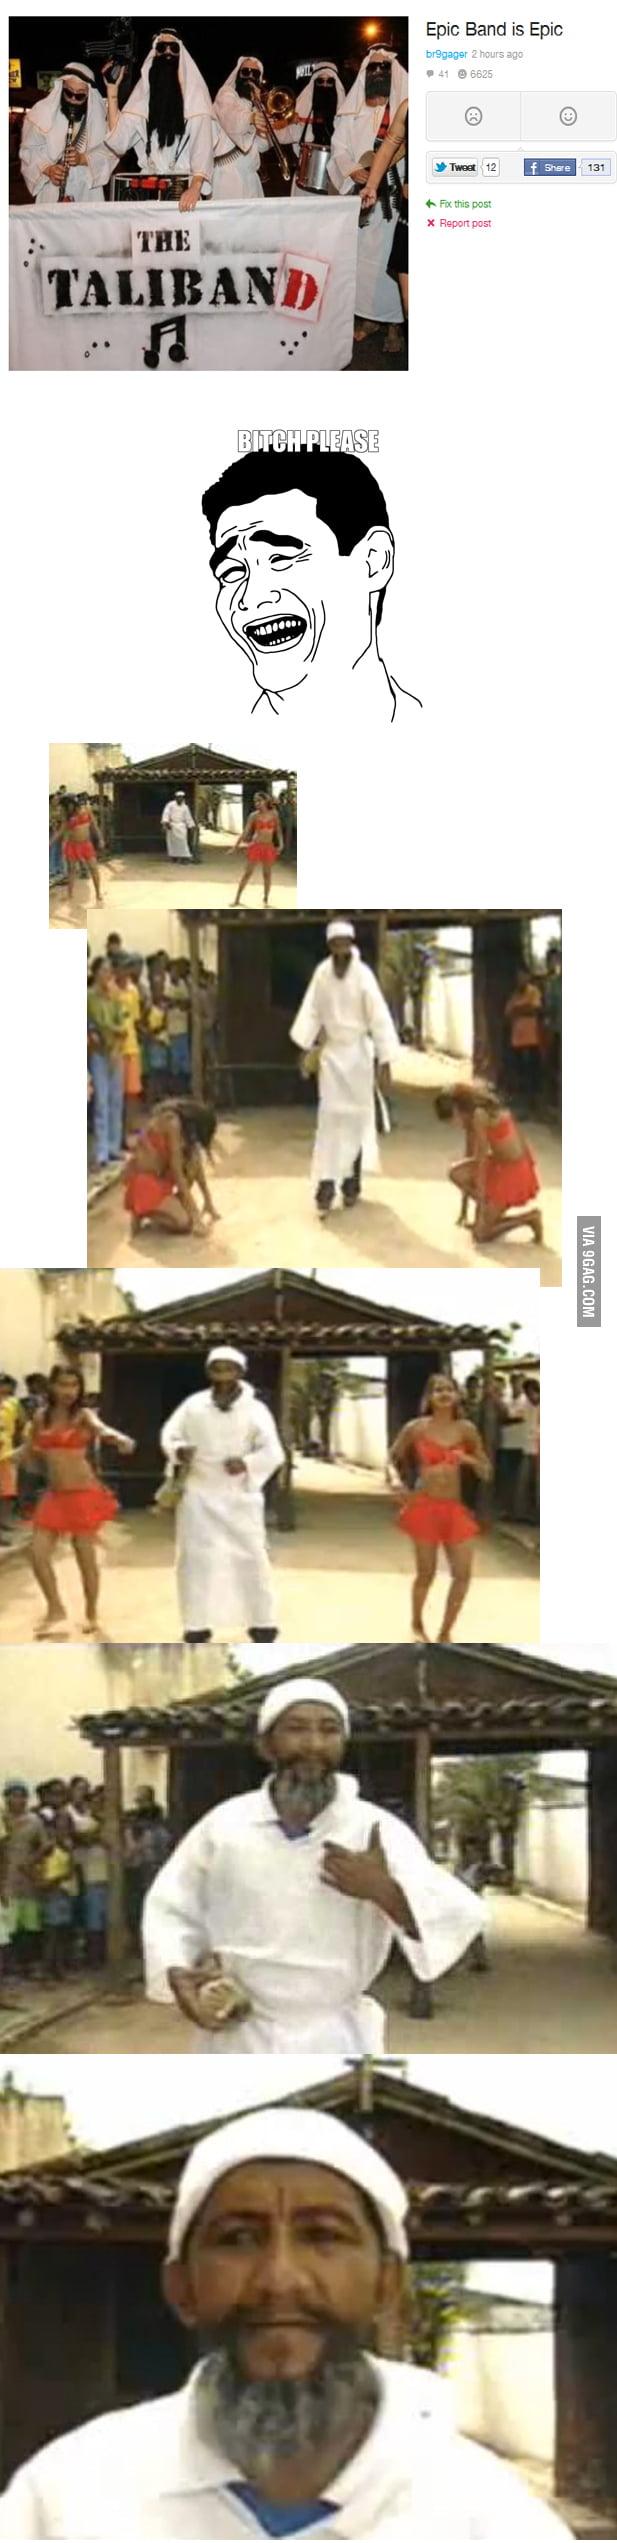 Bin Laden do Brega